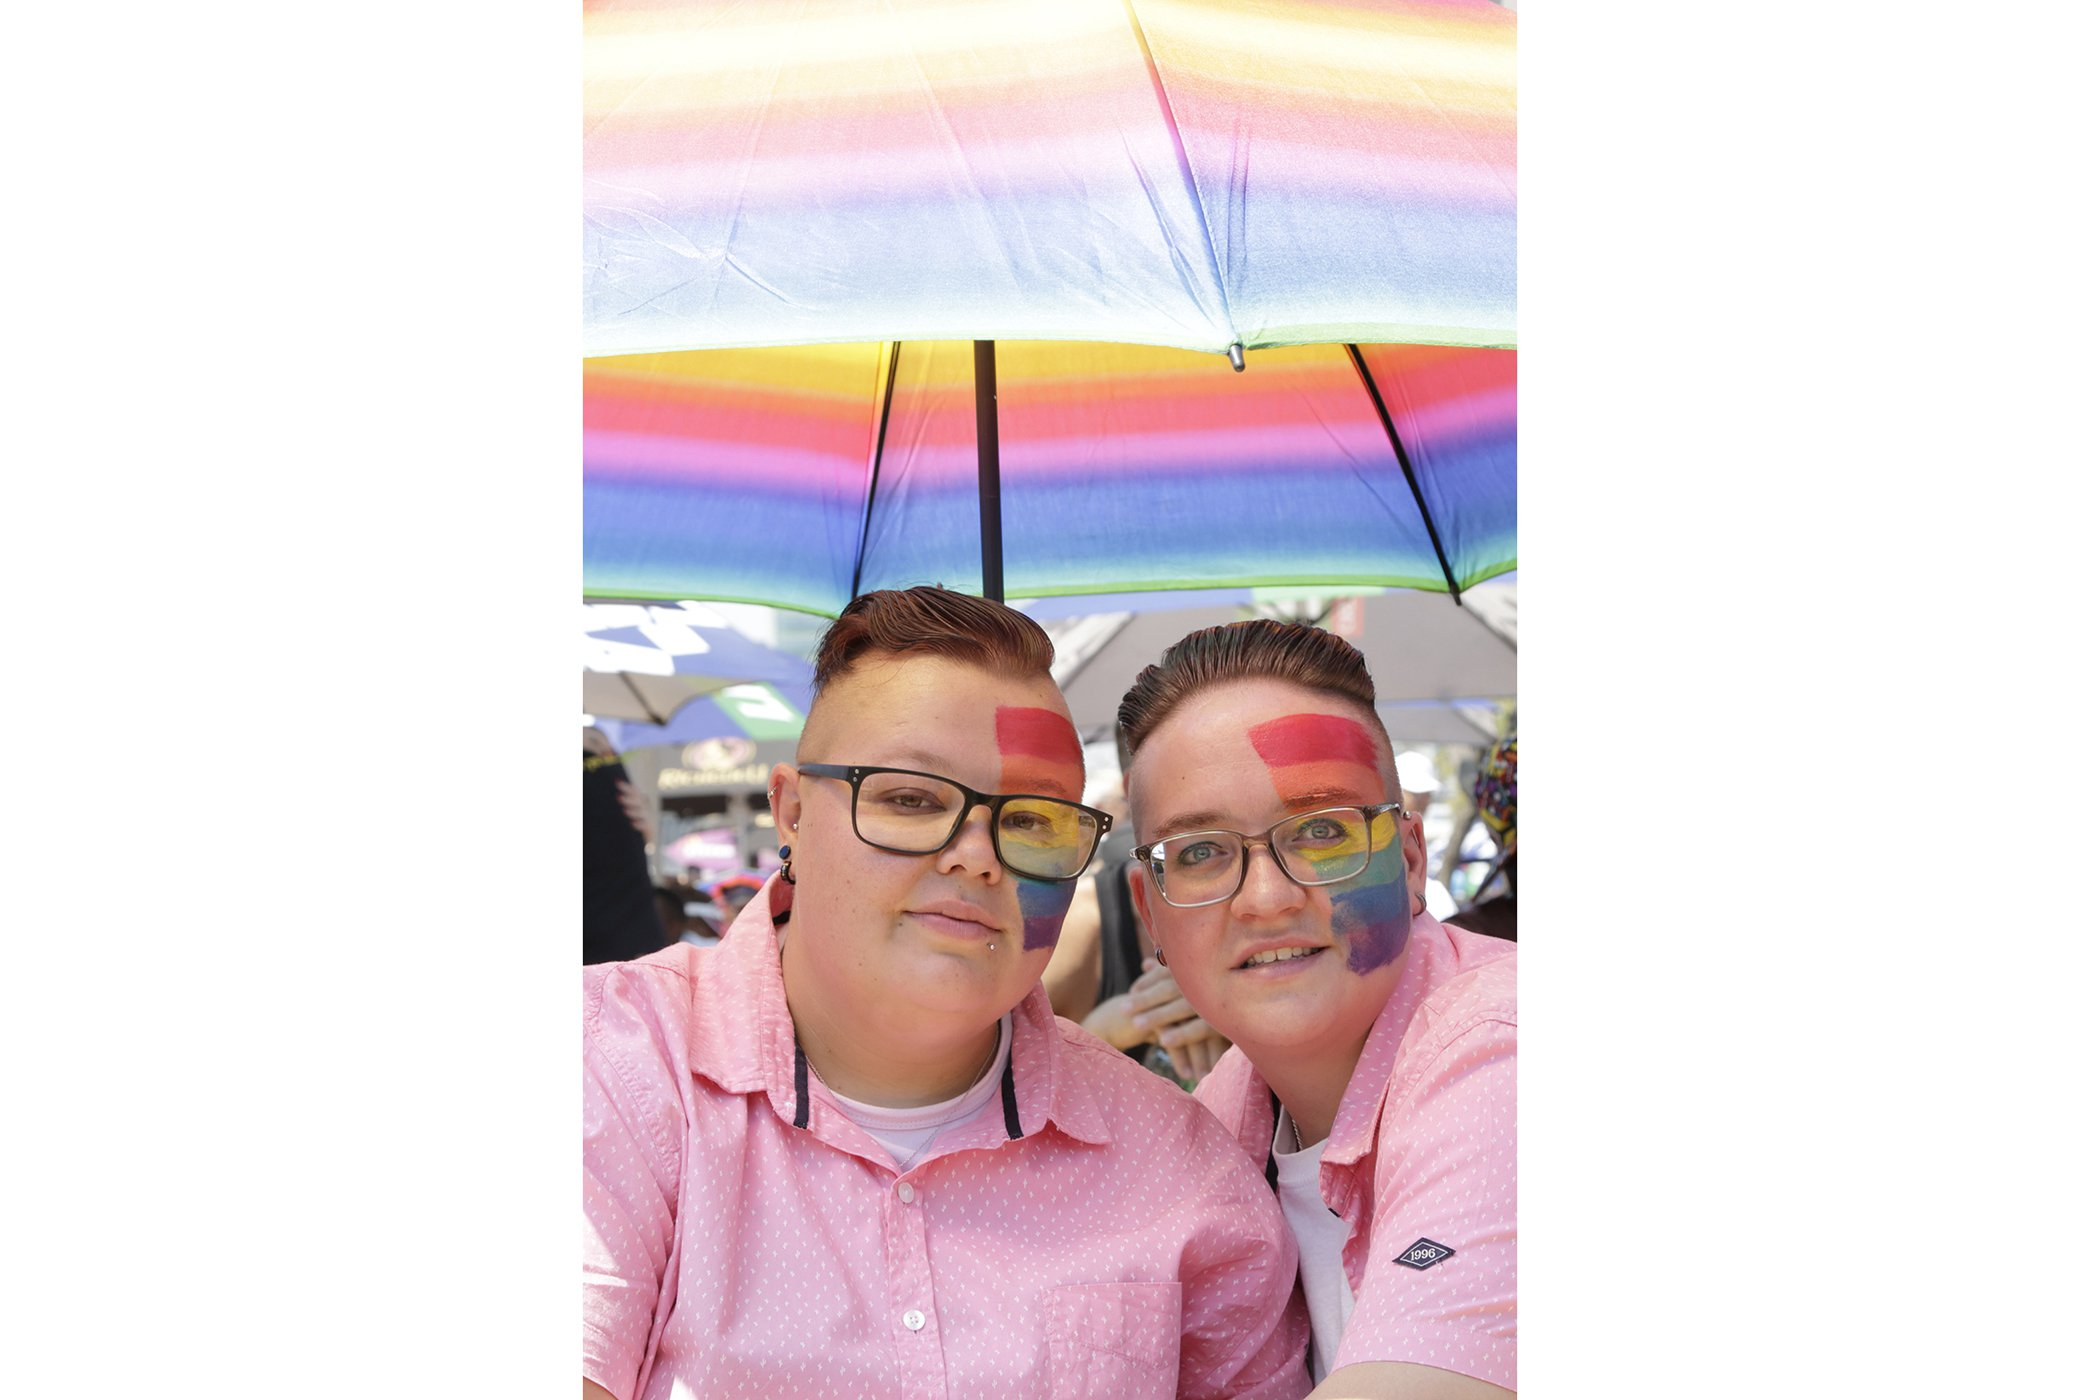 Johannesburg_Pride_LGBTQ_Noncedo Gxekwa_028-FULL.jpg